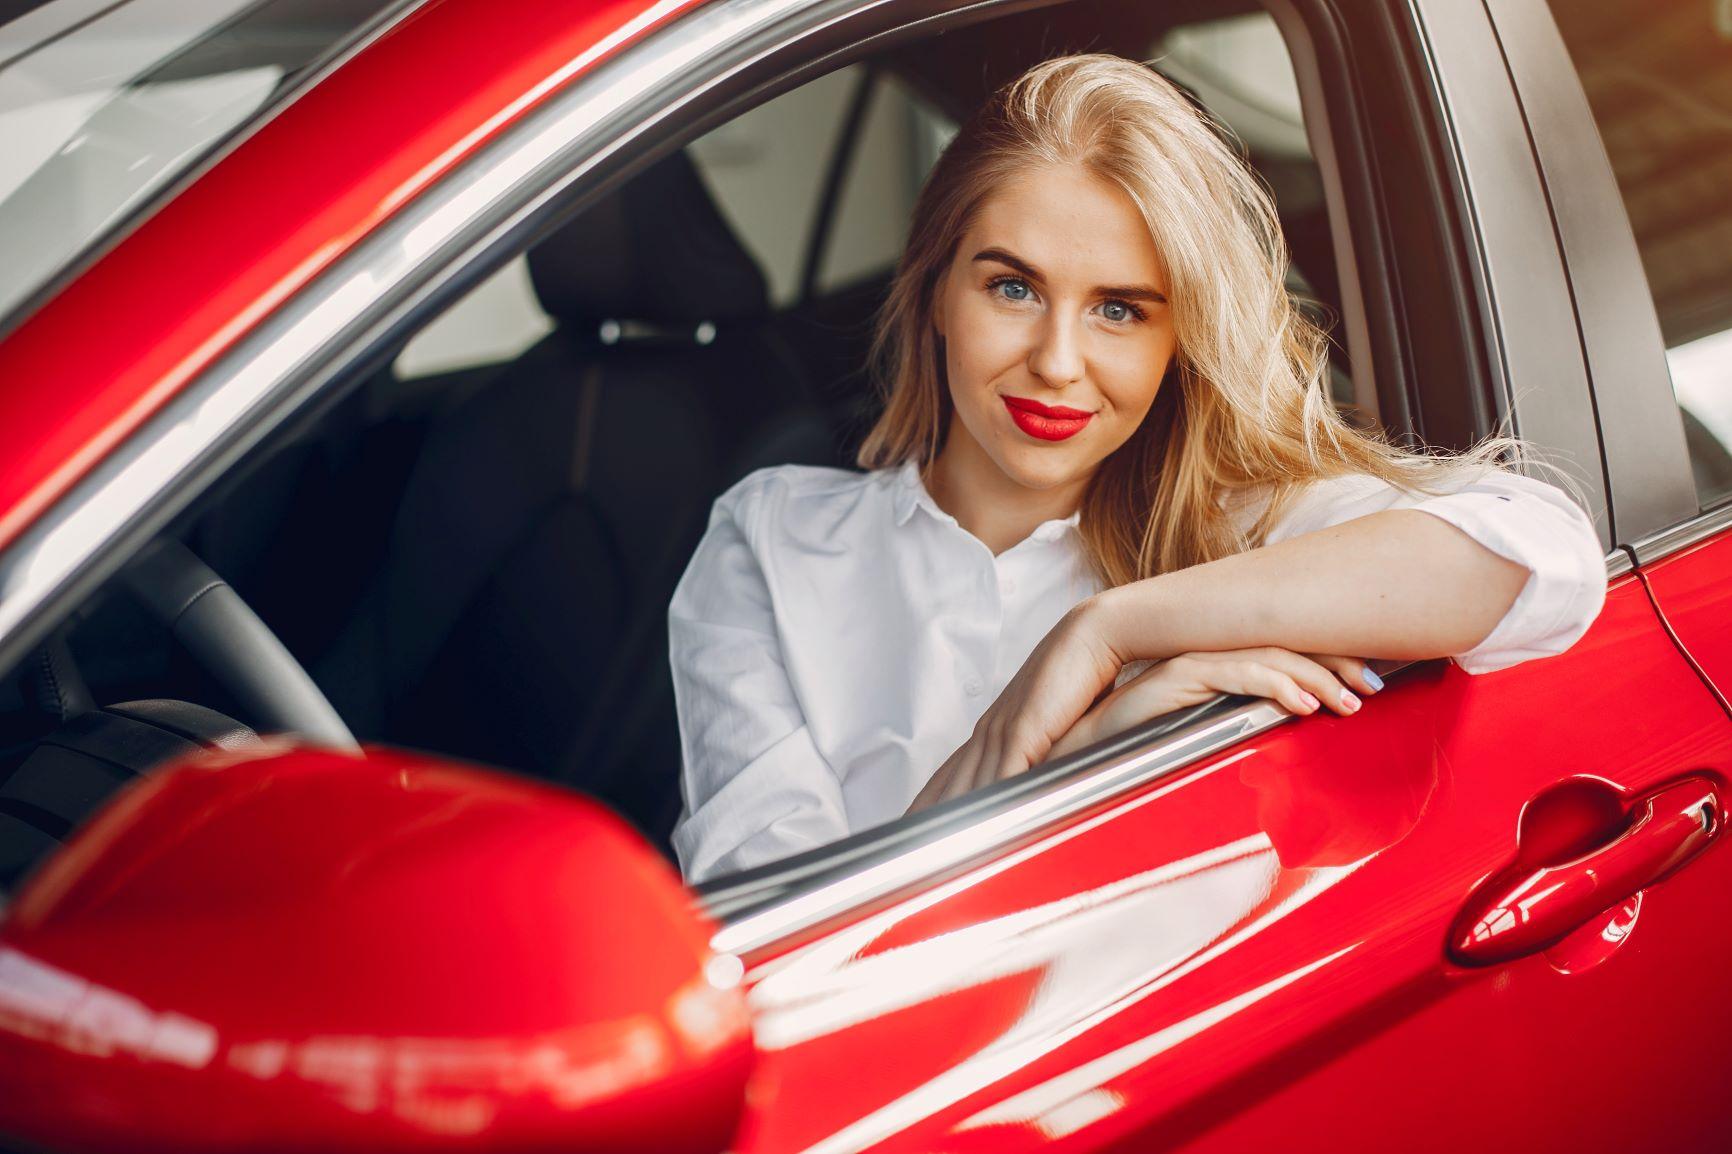 Blonde hair girl in red car